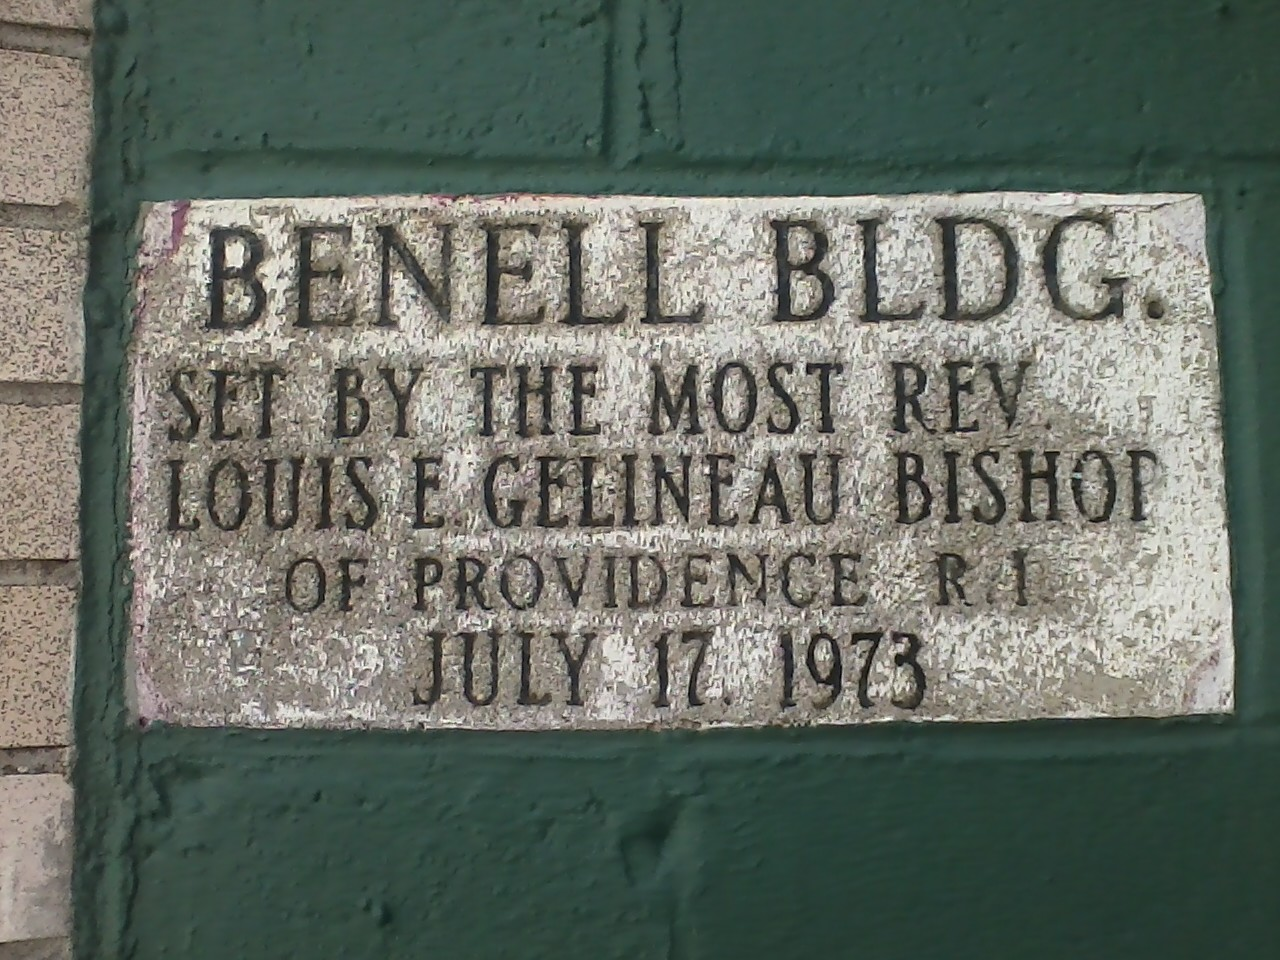 Benell Bldg.